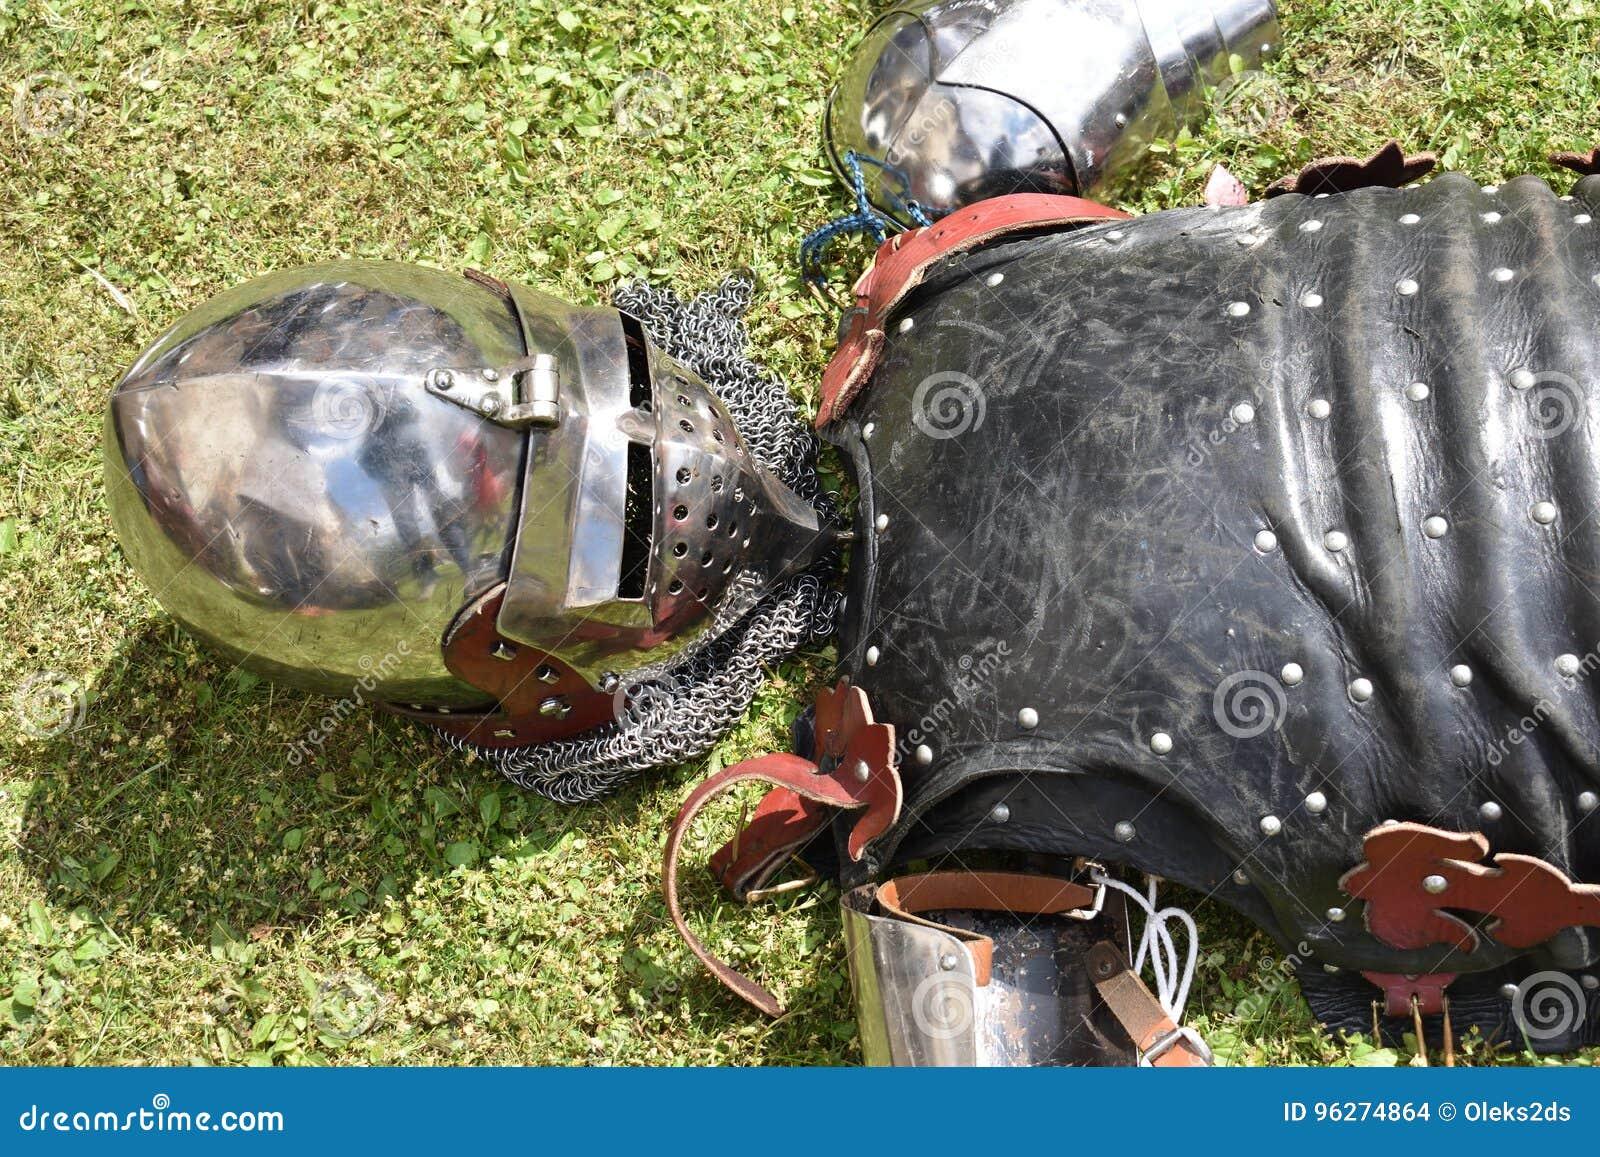 Medieval Knight`s Armor: Helmet, Cuirass And Arm Bracers